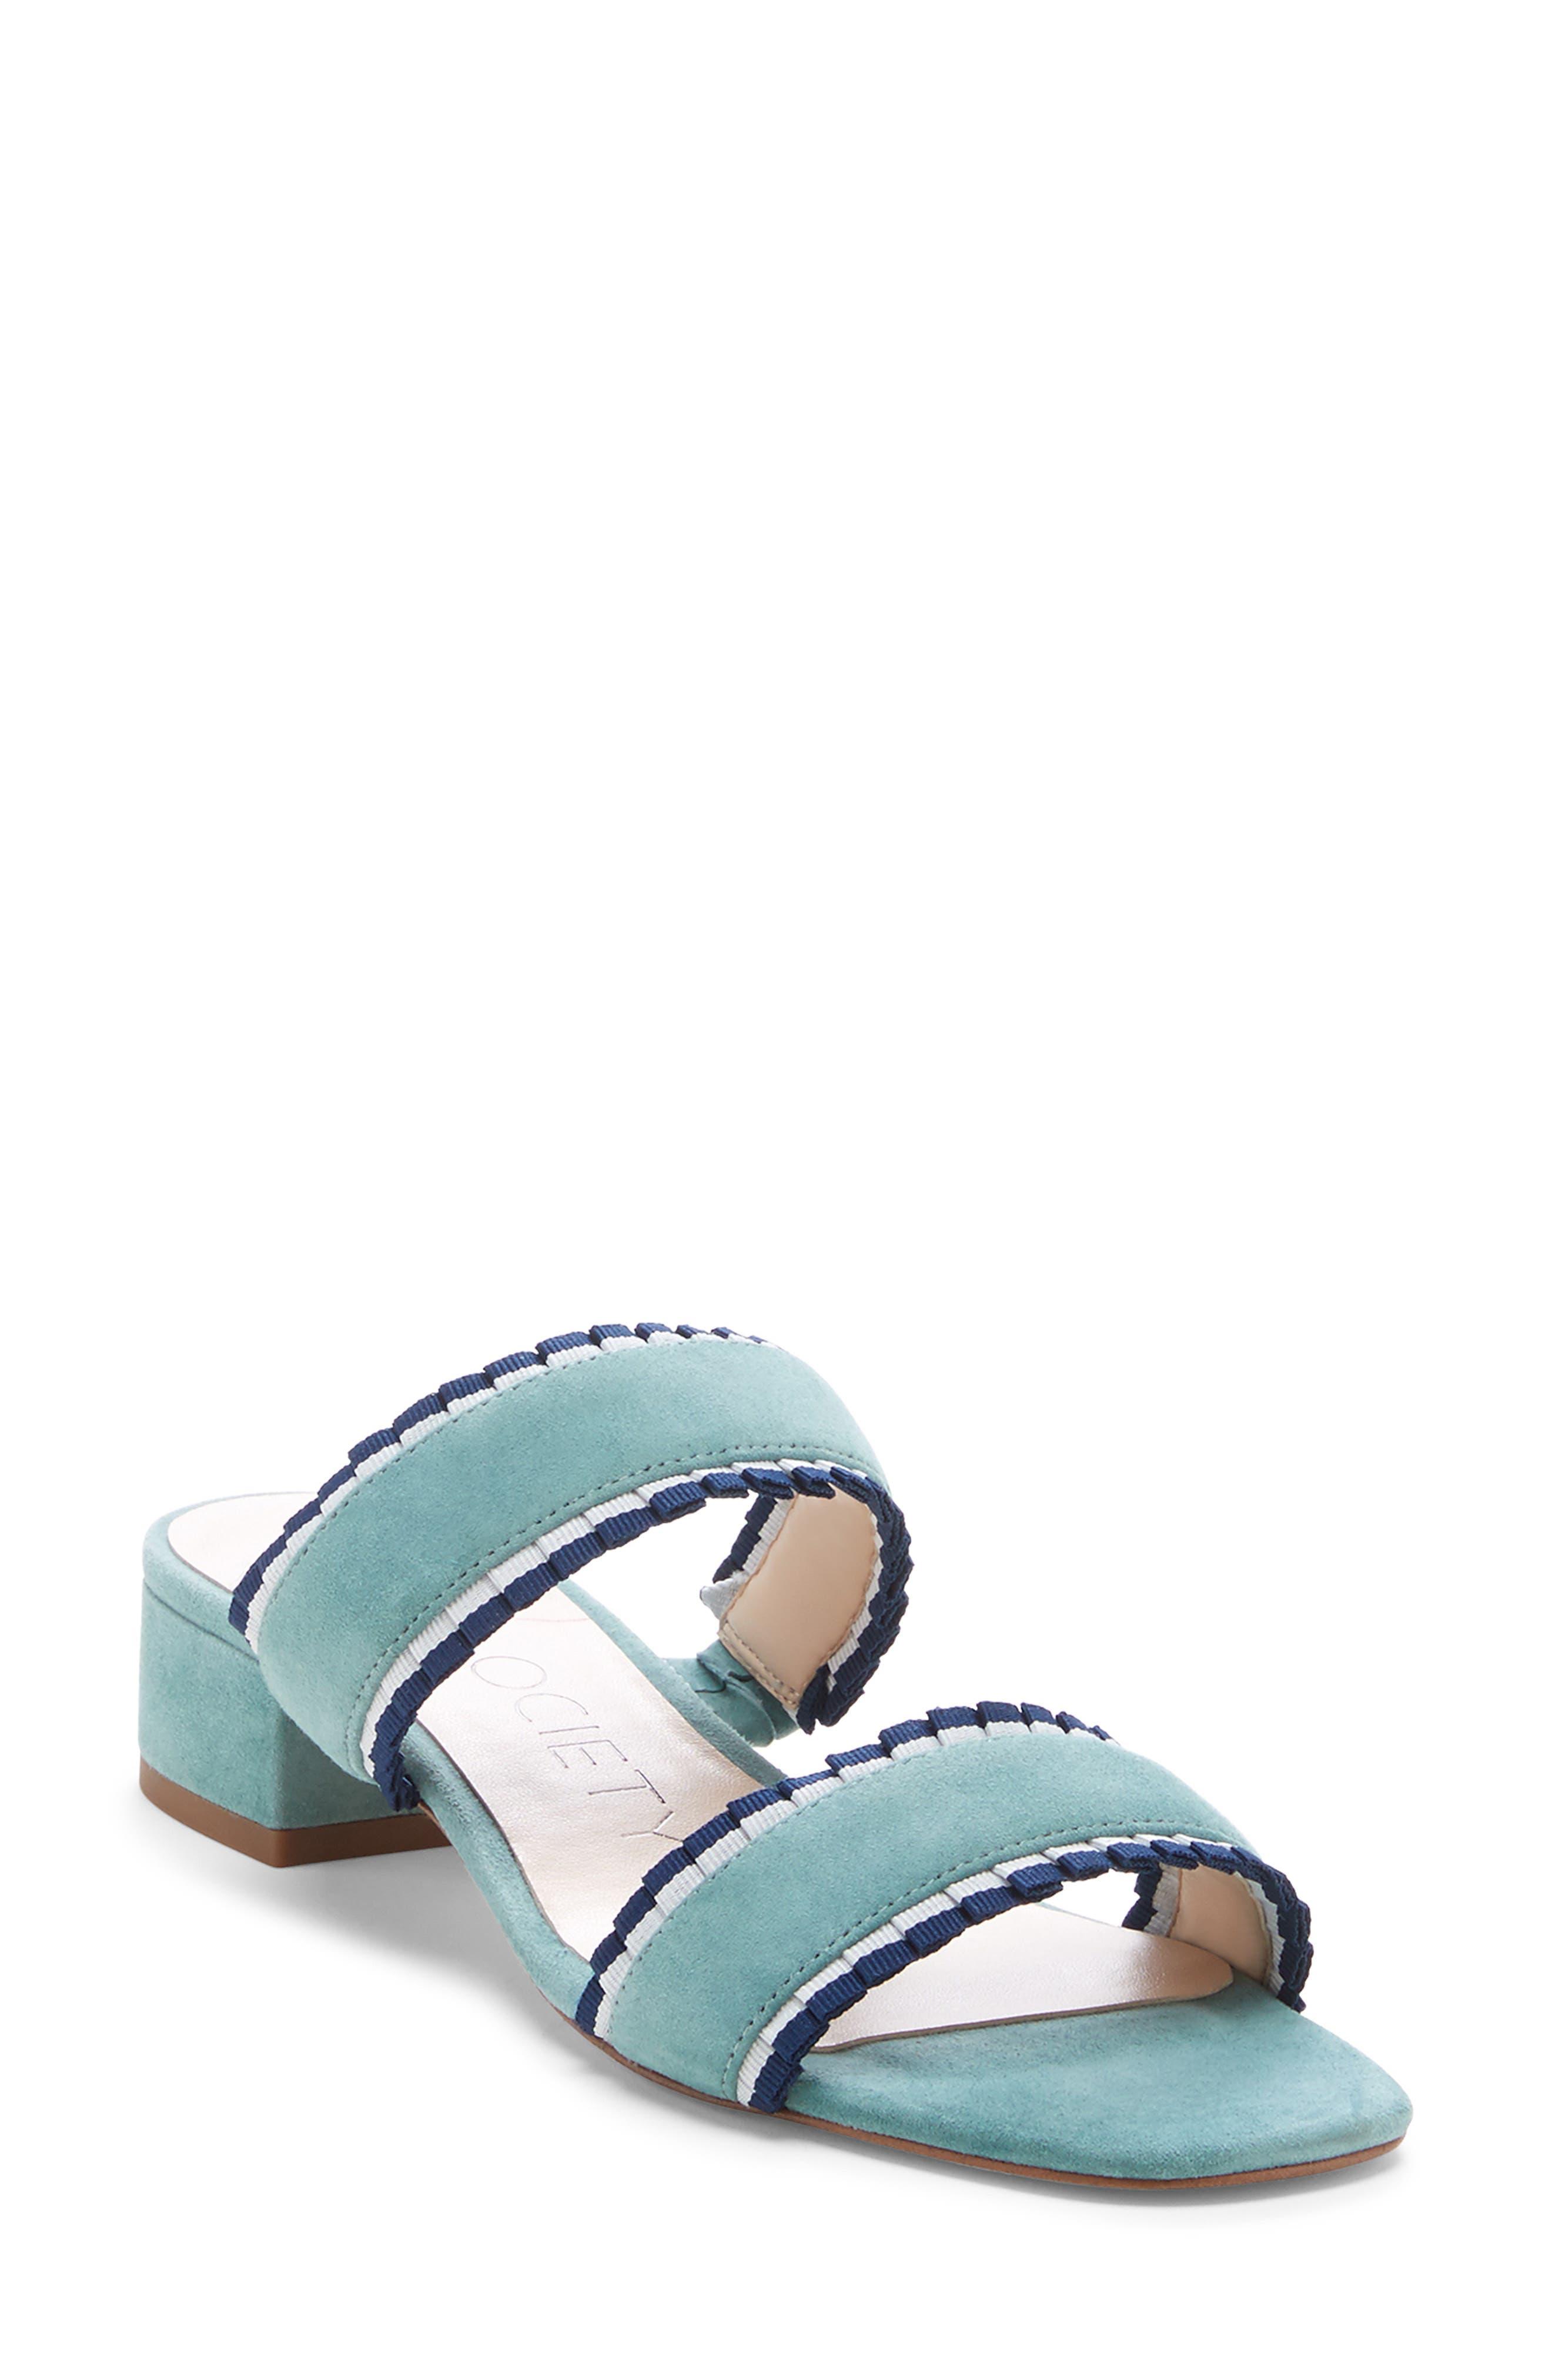 SOLE SOCIETY,                             Elura Slide Sandal,                             Main thumbnail 1, color,                             LIGHT SEA GREEN SUEDE